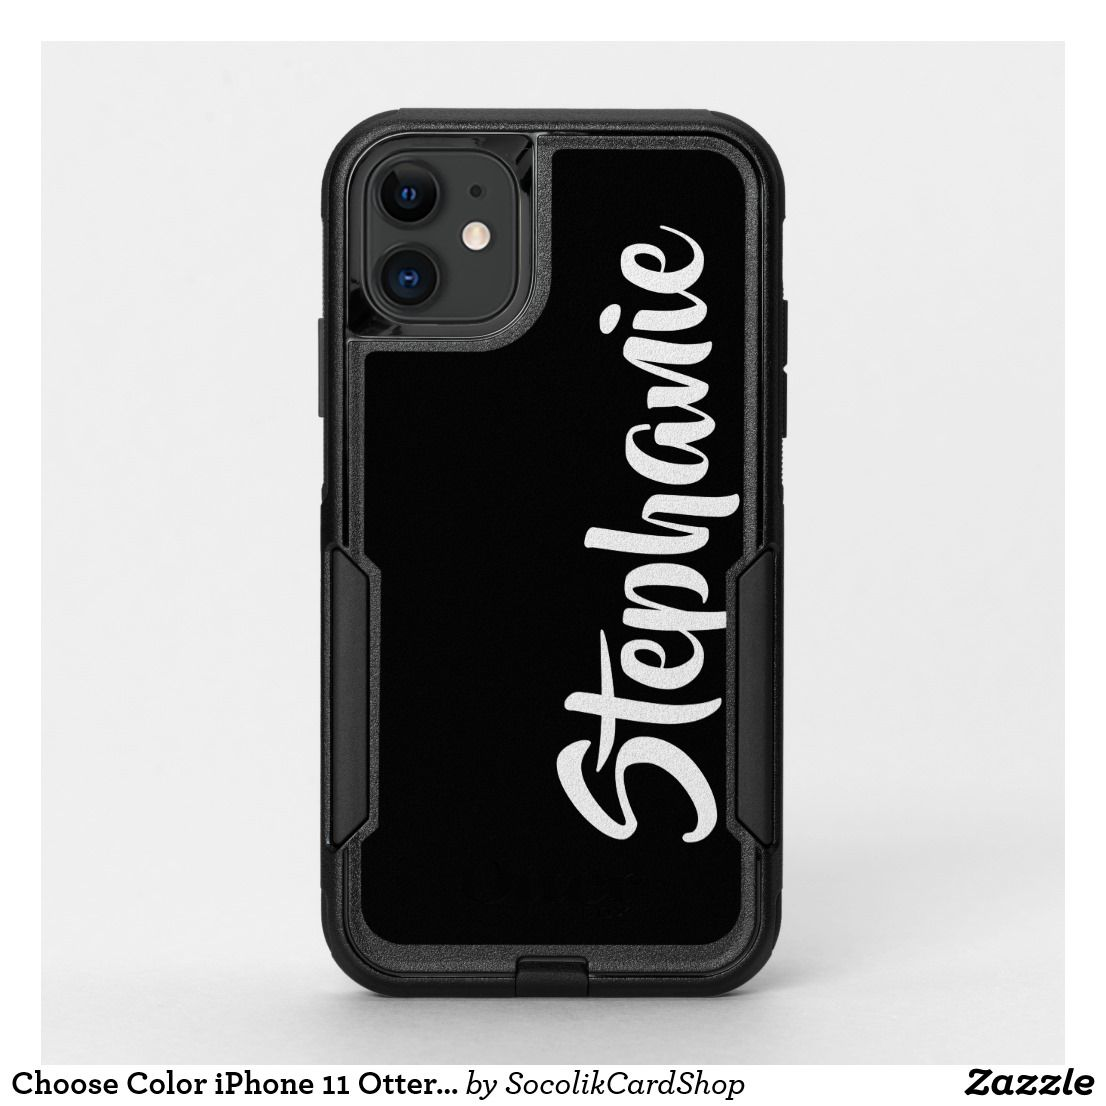 Choose color iphone otterbox custom case